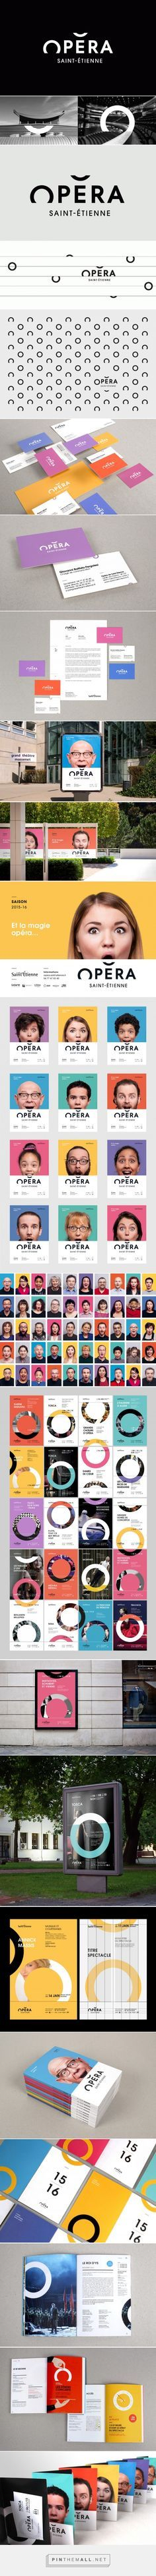 dans-ta-pub-creation-brand-identity-compilation-20